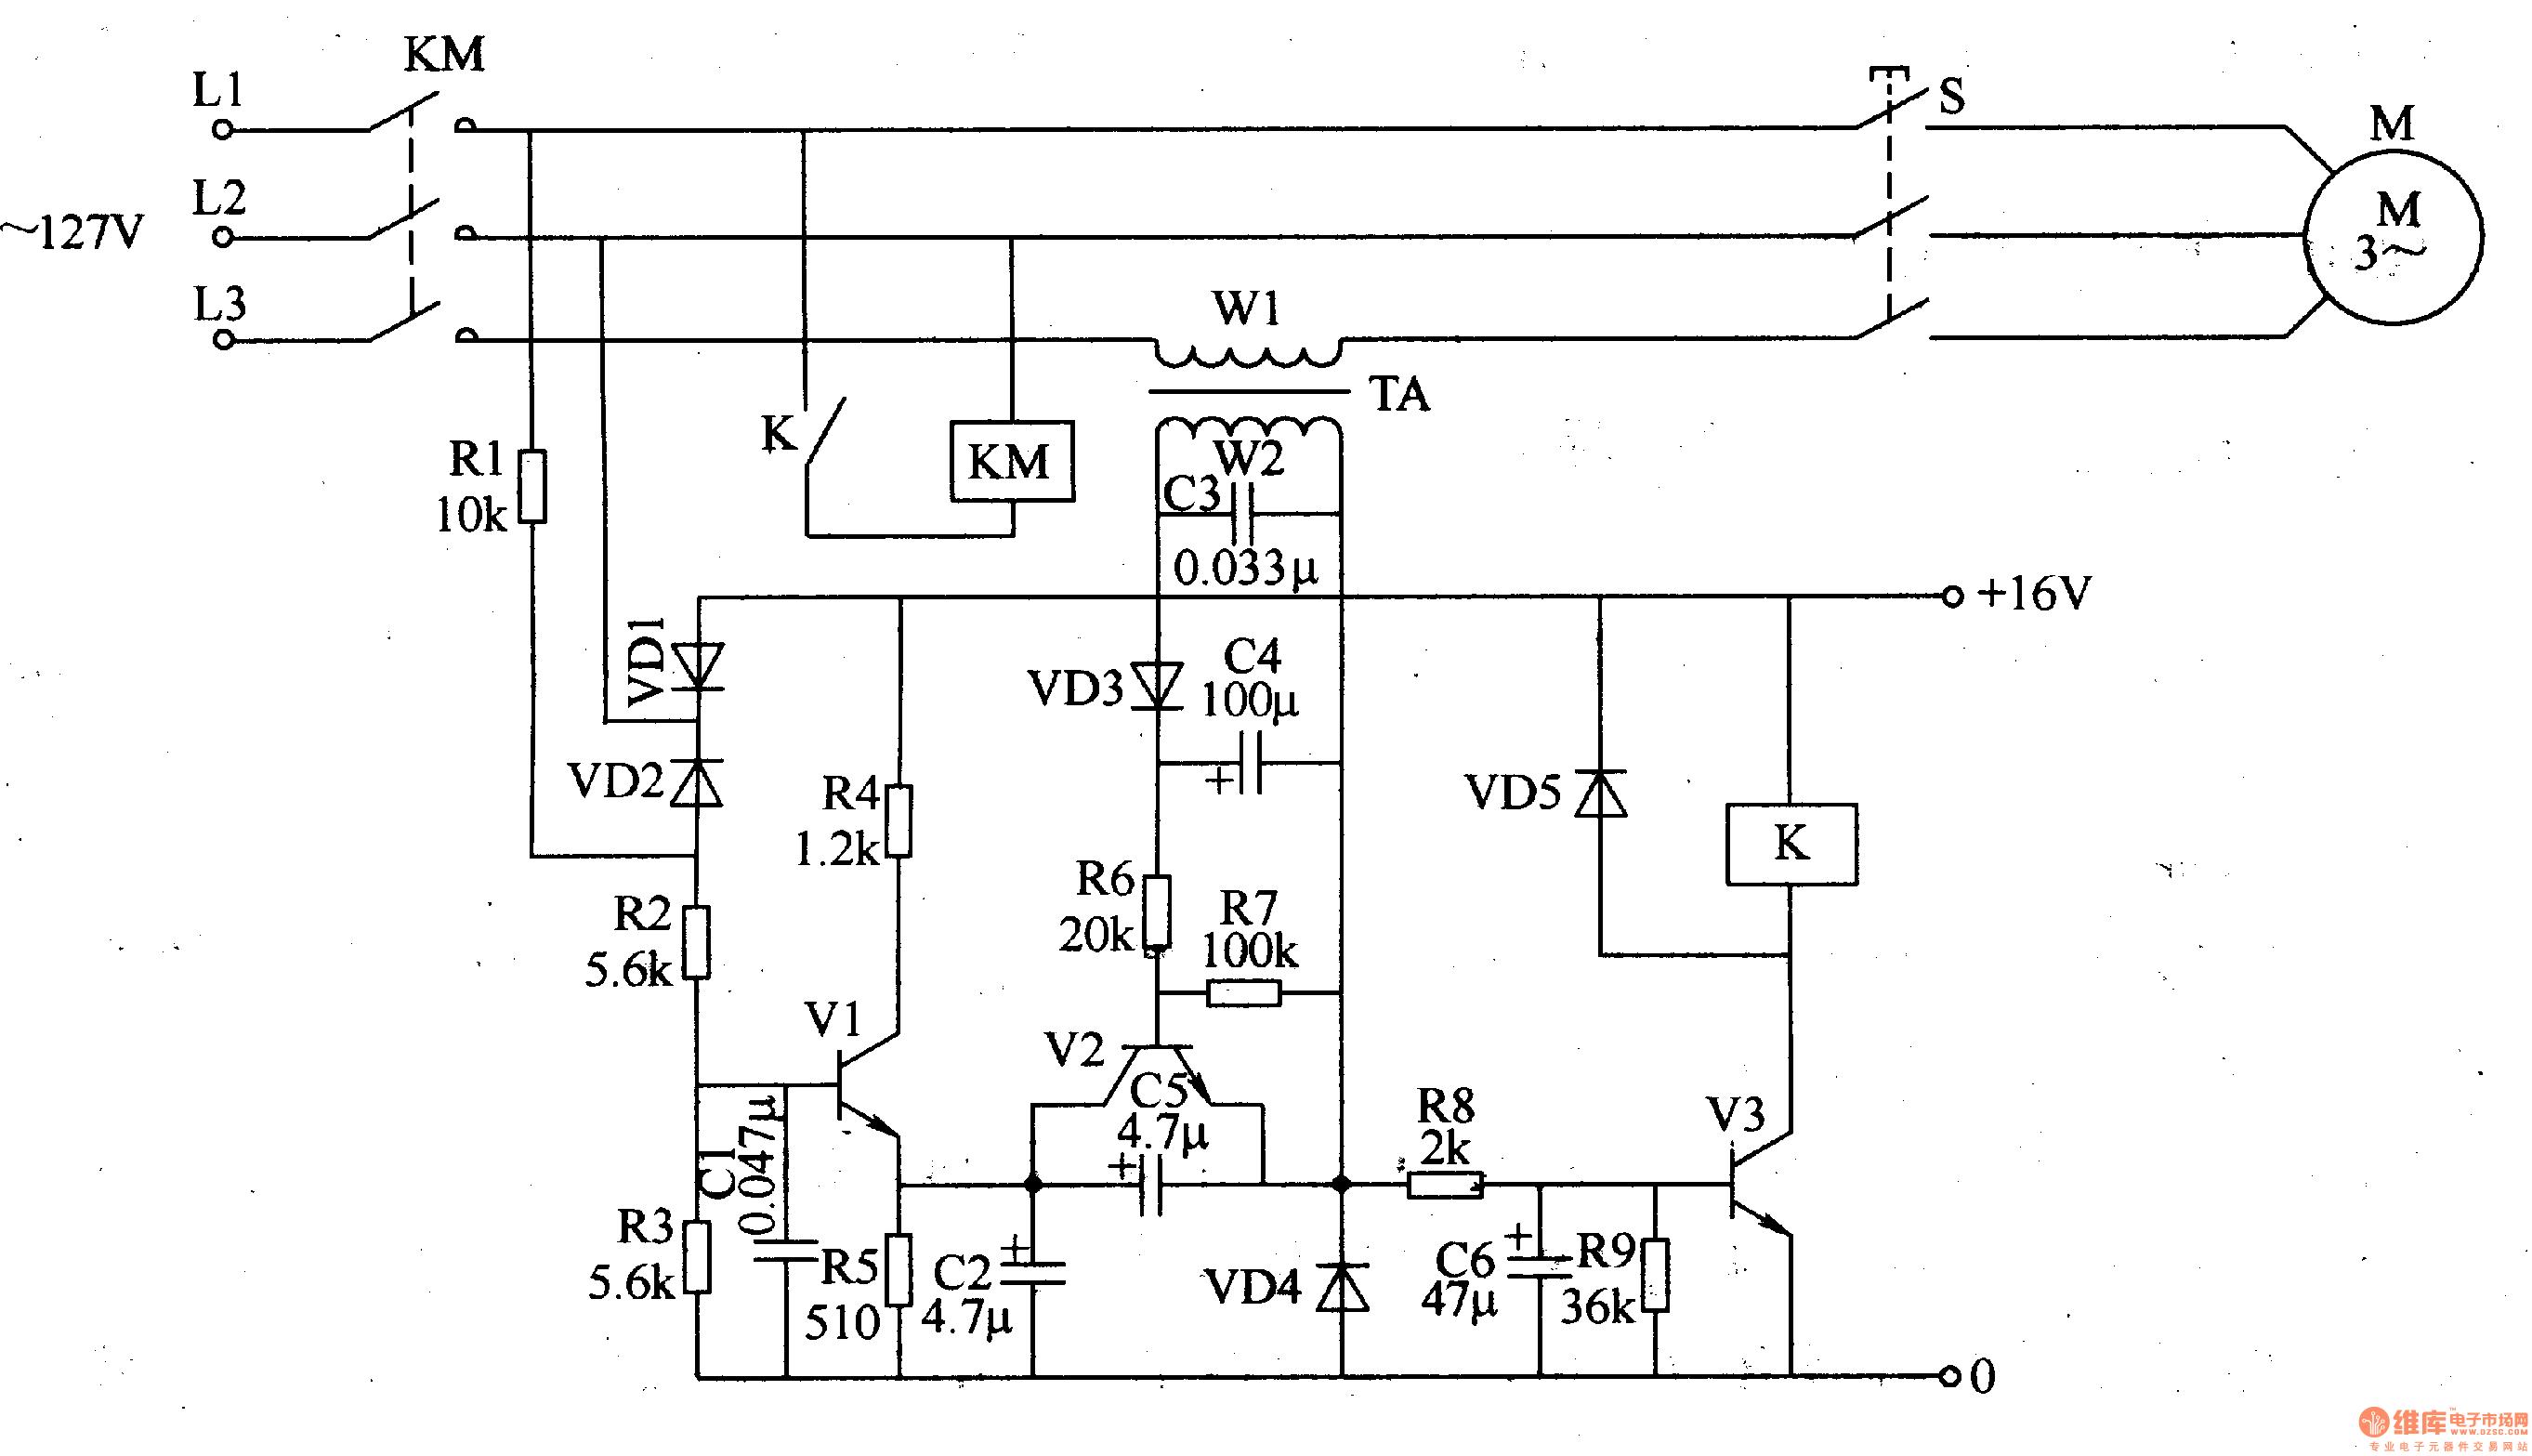 DIAGRAM] Circuit Diagram Of An Ac Drill FULL Version HD Quality Ac Drill -  SCHEMAPSY.SPANIENREP.DEDiagram Files Collections - spanienrep.de